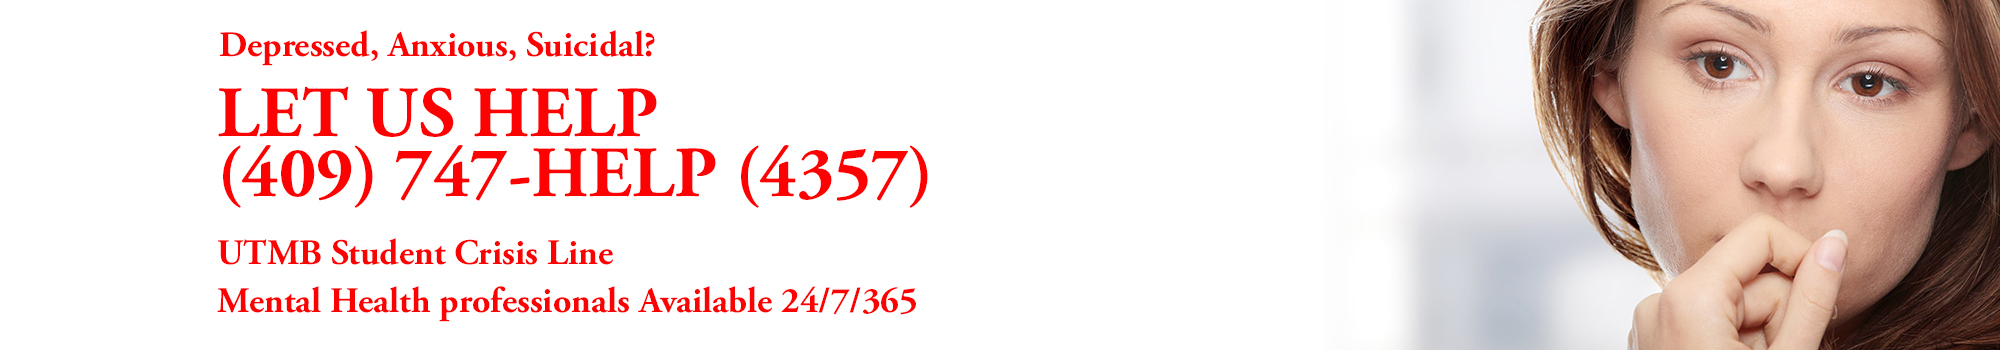 student-health-mental-health-hotline_adj